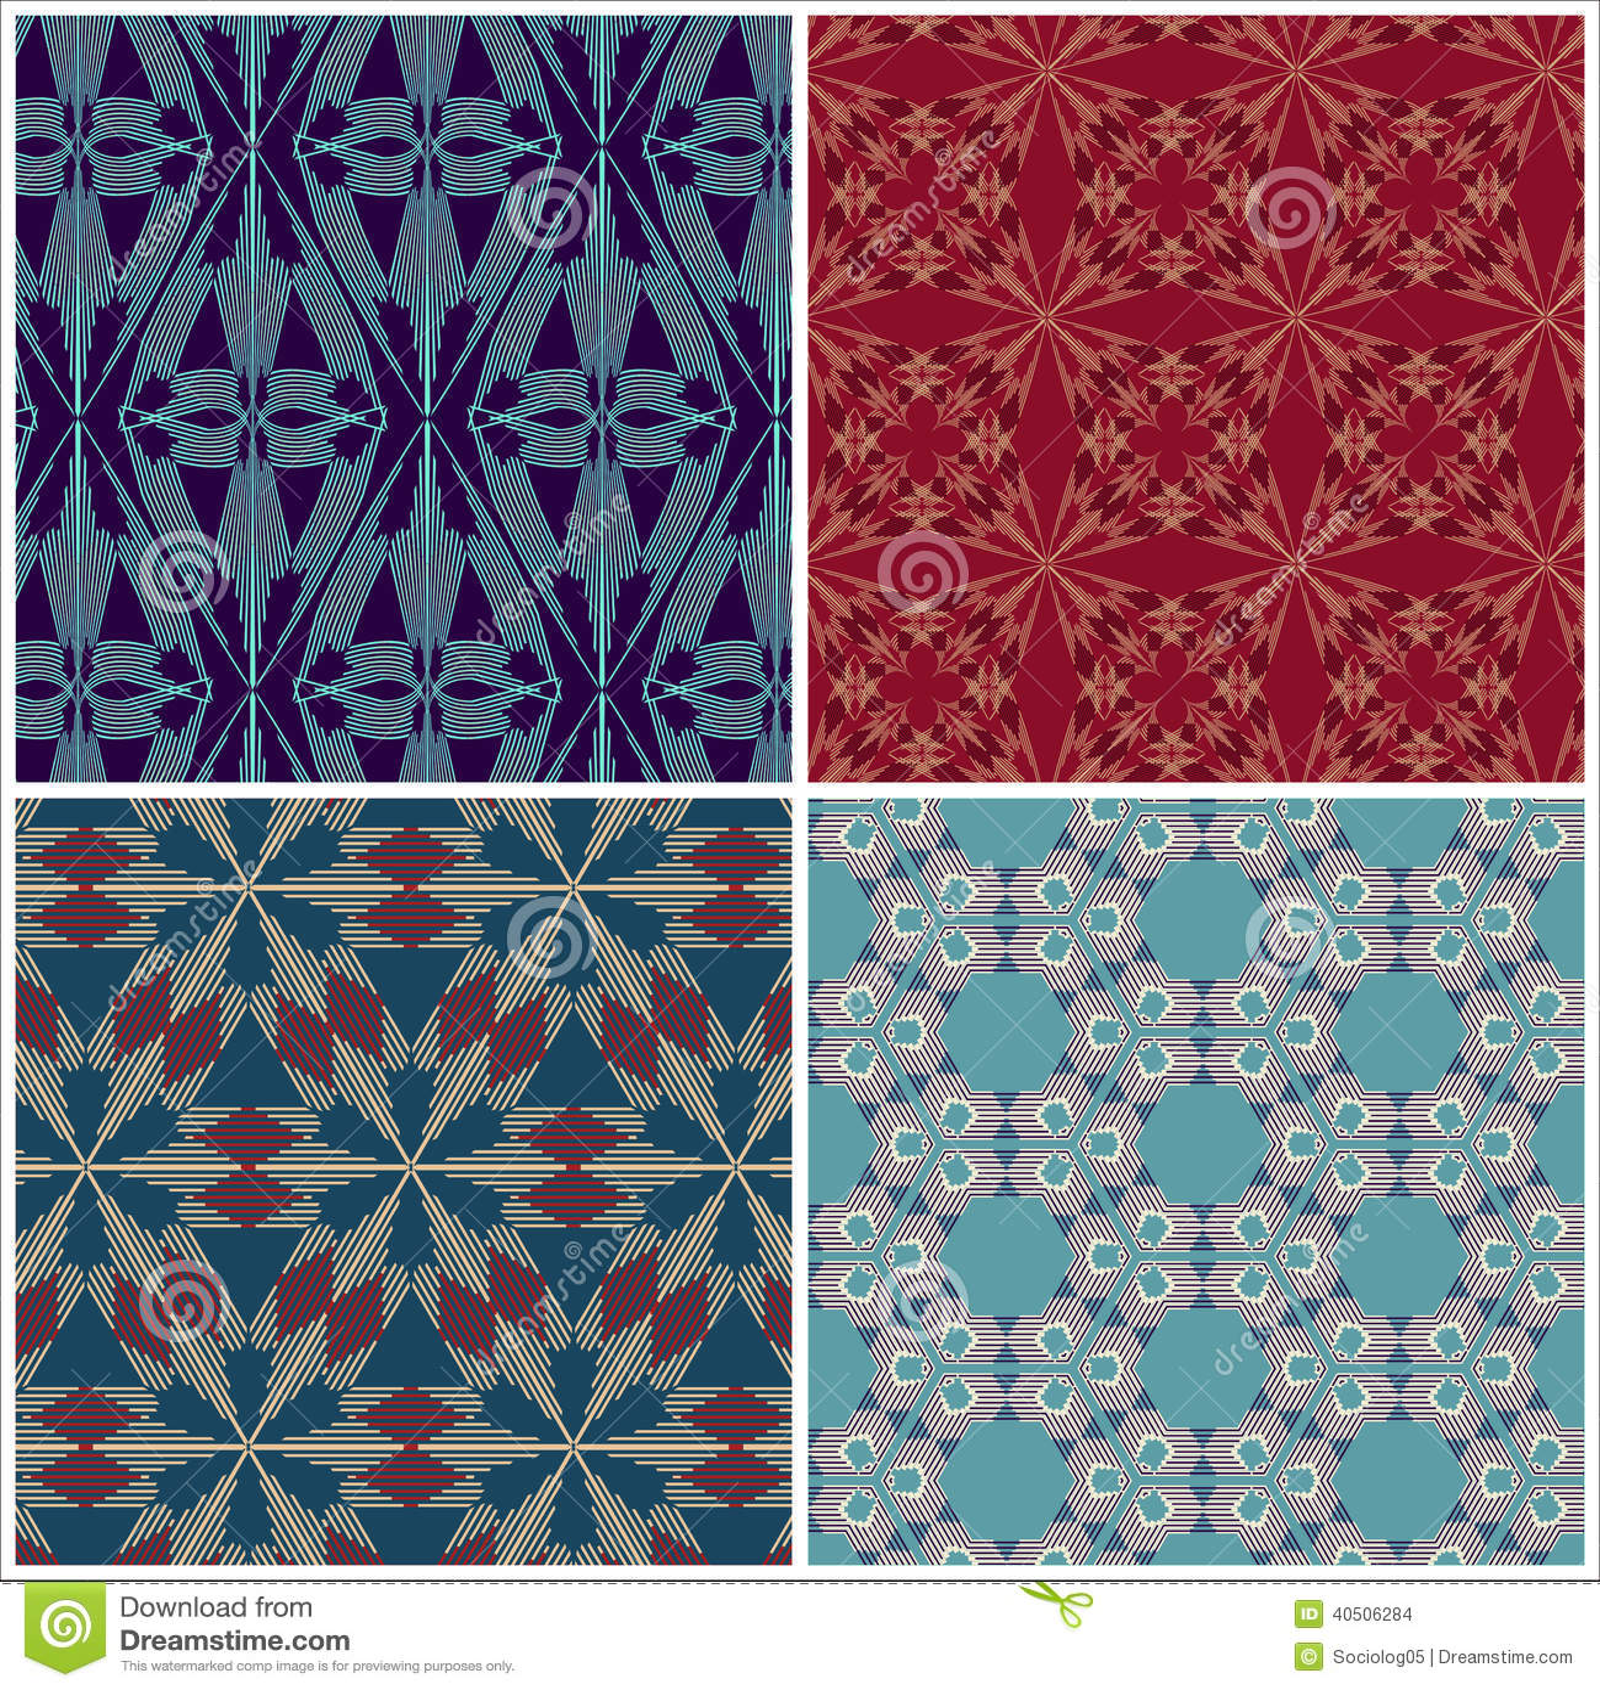 Set of seamless patterns for tapestry, craftsmanship